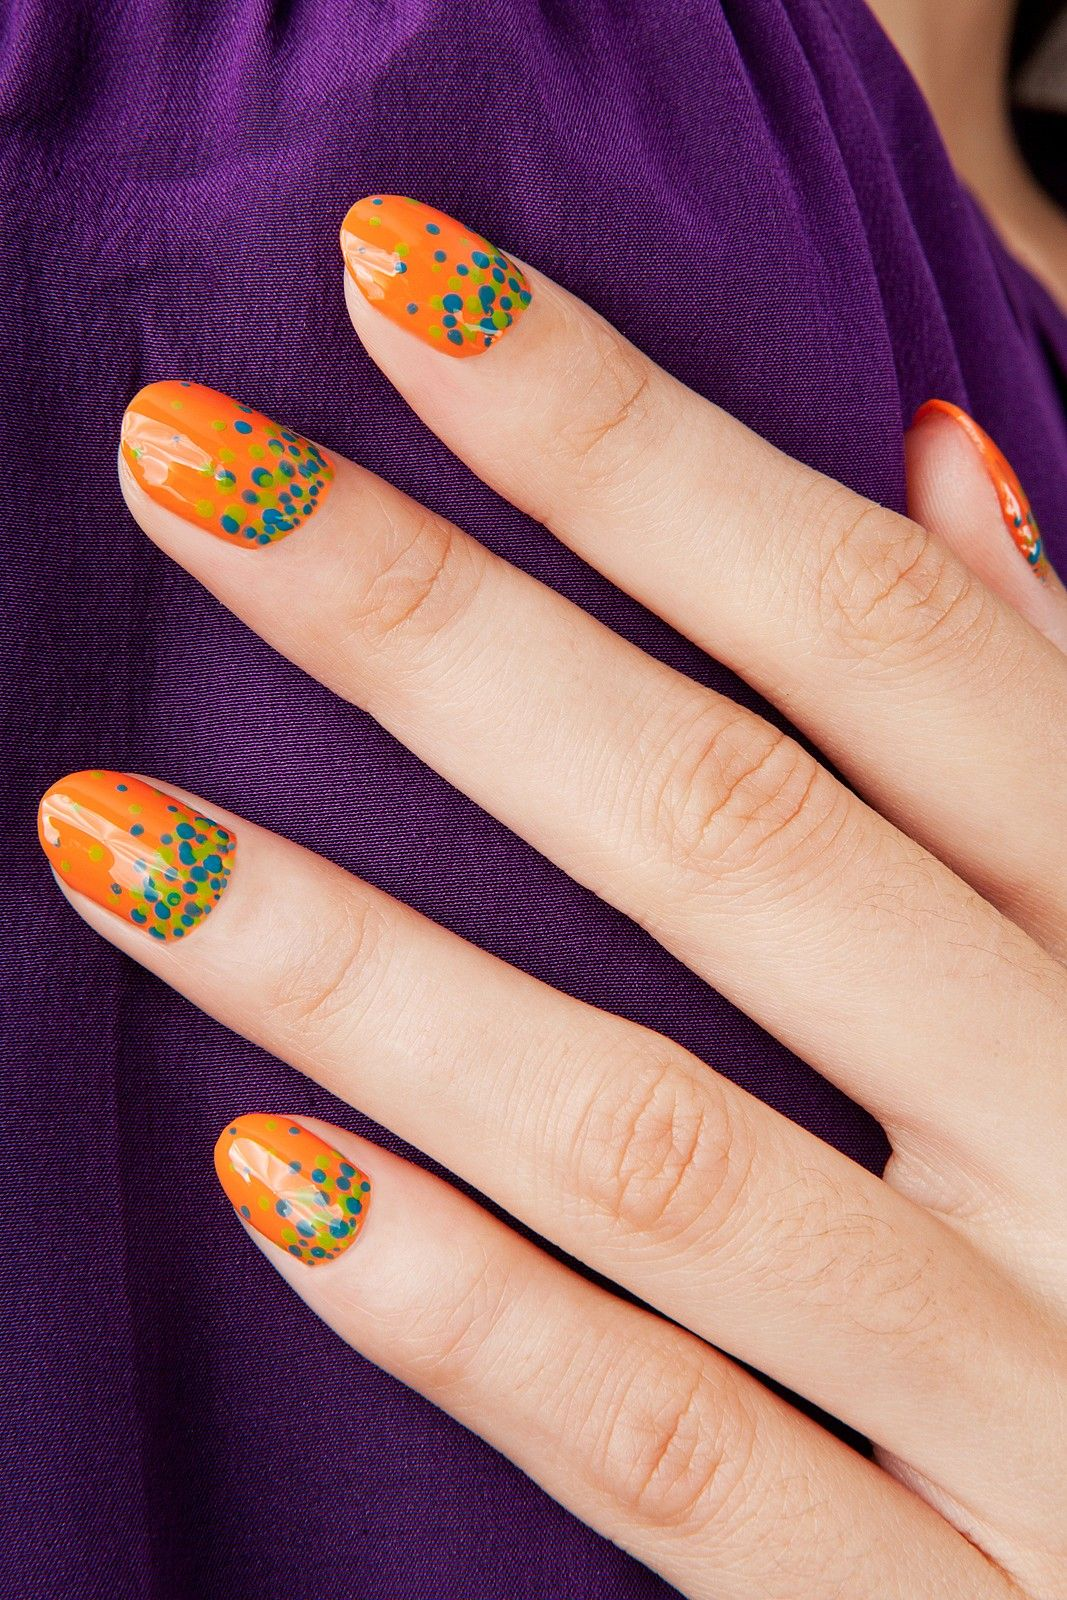 Best New Finger Art Style - The Pop Fizz